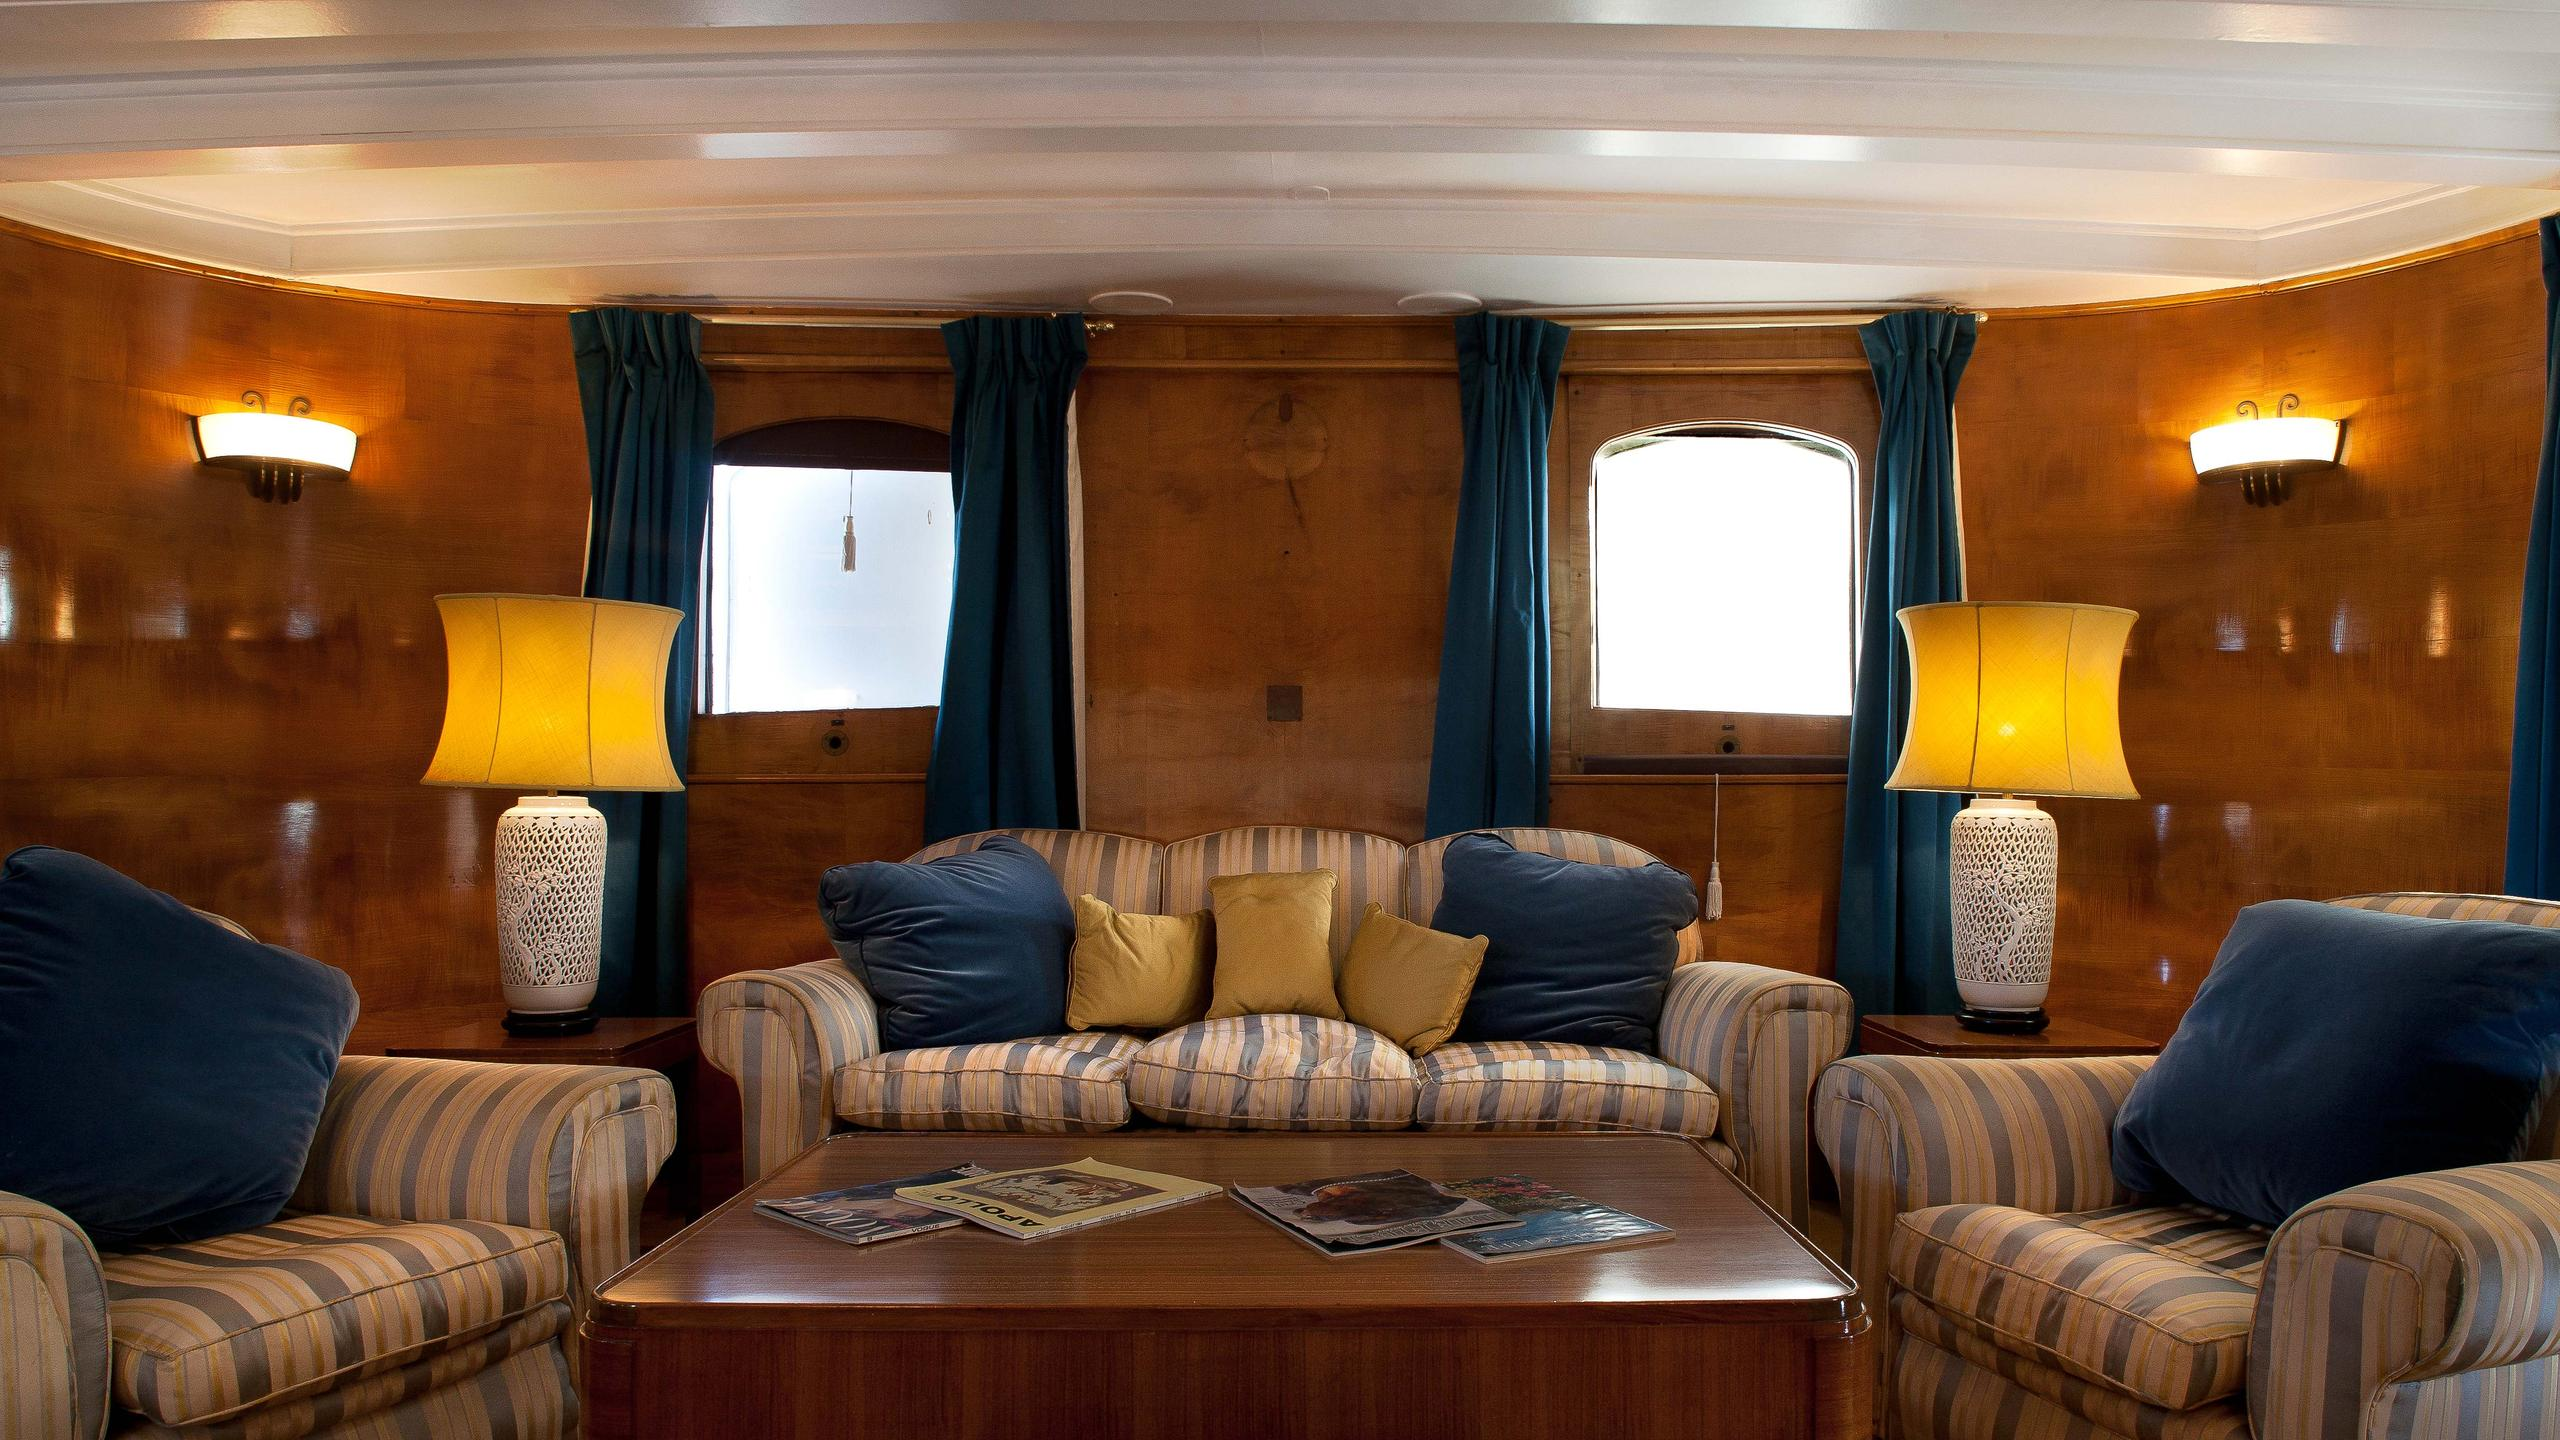 Shemara-classic-motor-yacht-1938-64m-sofa-armchairs-saloon